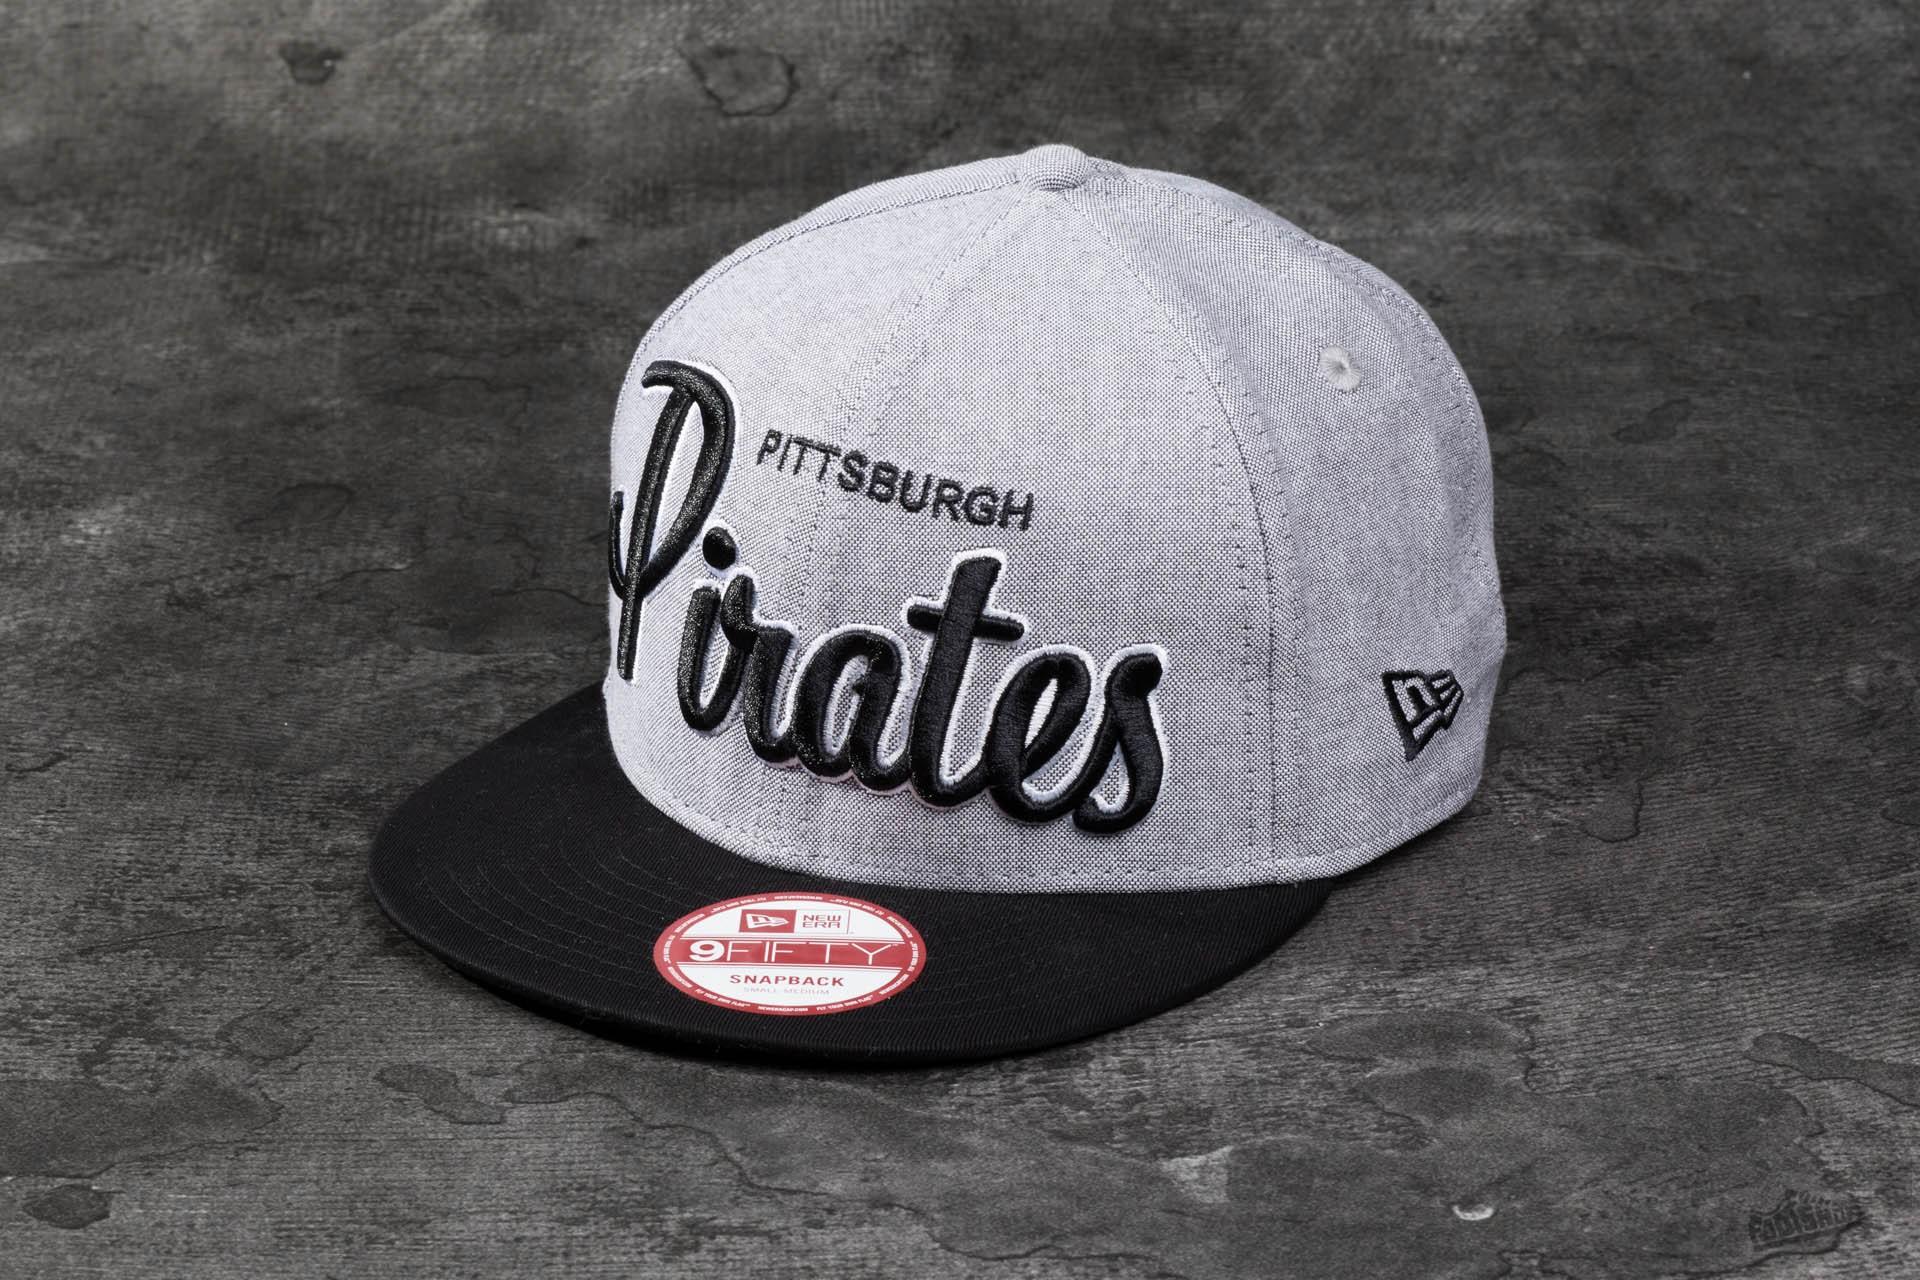 cbba4dd2cab New Era Retroscholar2 Pittsburgh Pirates Black